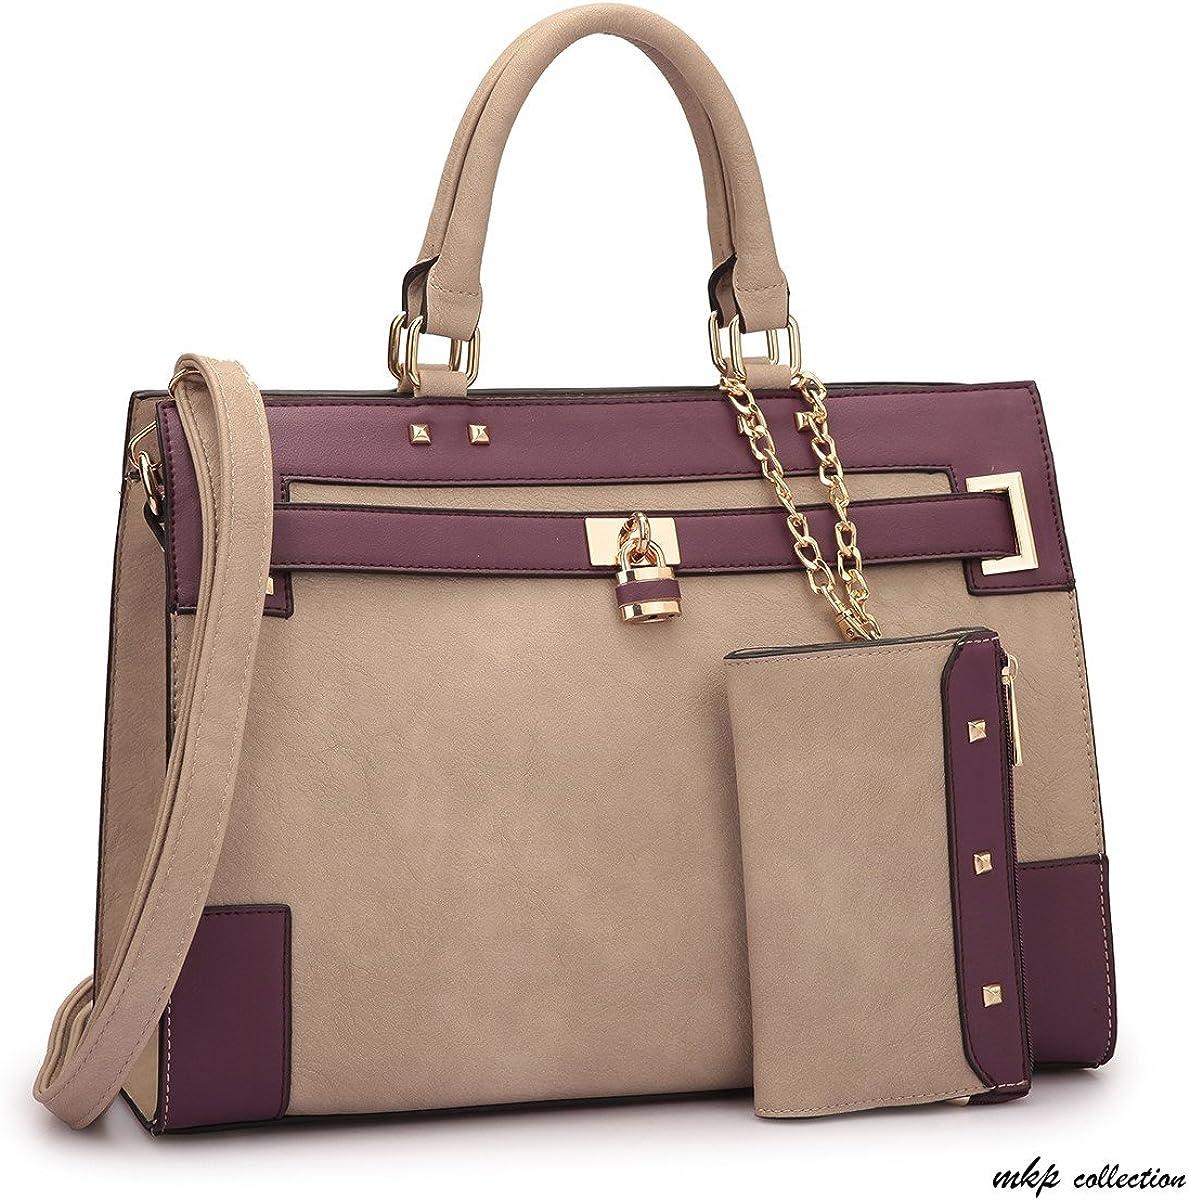 Two Tone Satchel Fashion woman Tote Trendy Lady Purse Designer handbag for all season